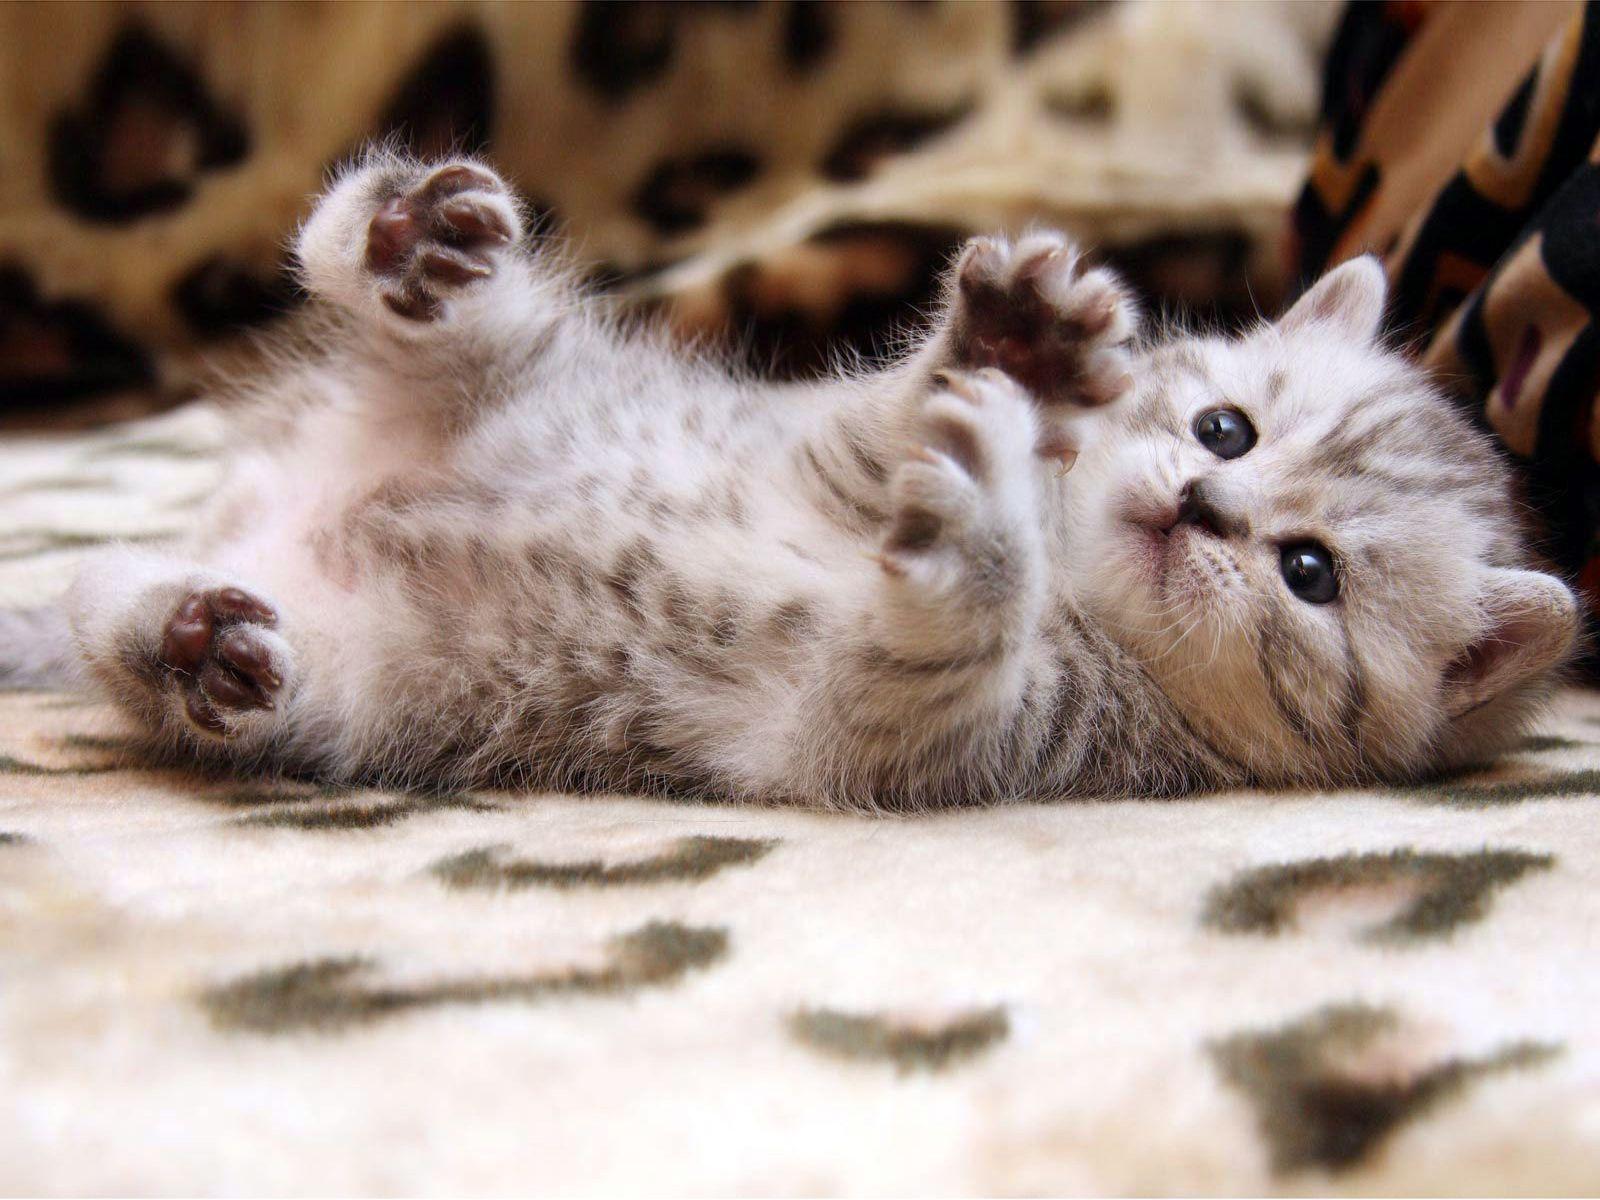 Cute Cat Iphone Wallpaper 1600x1200